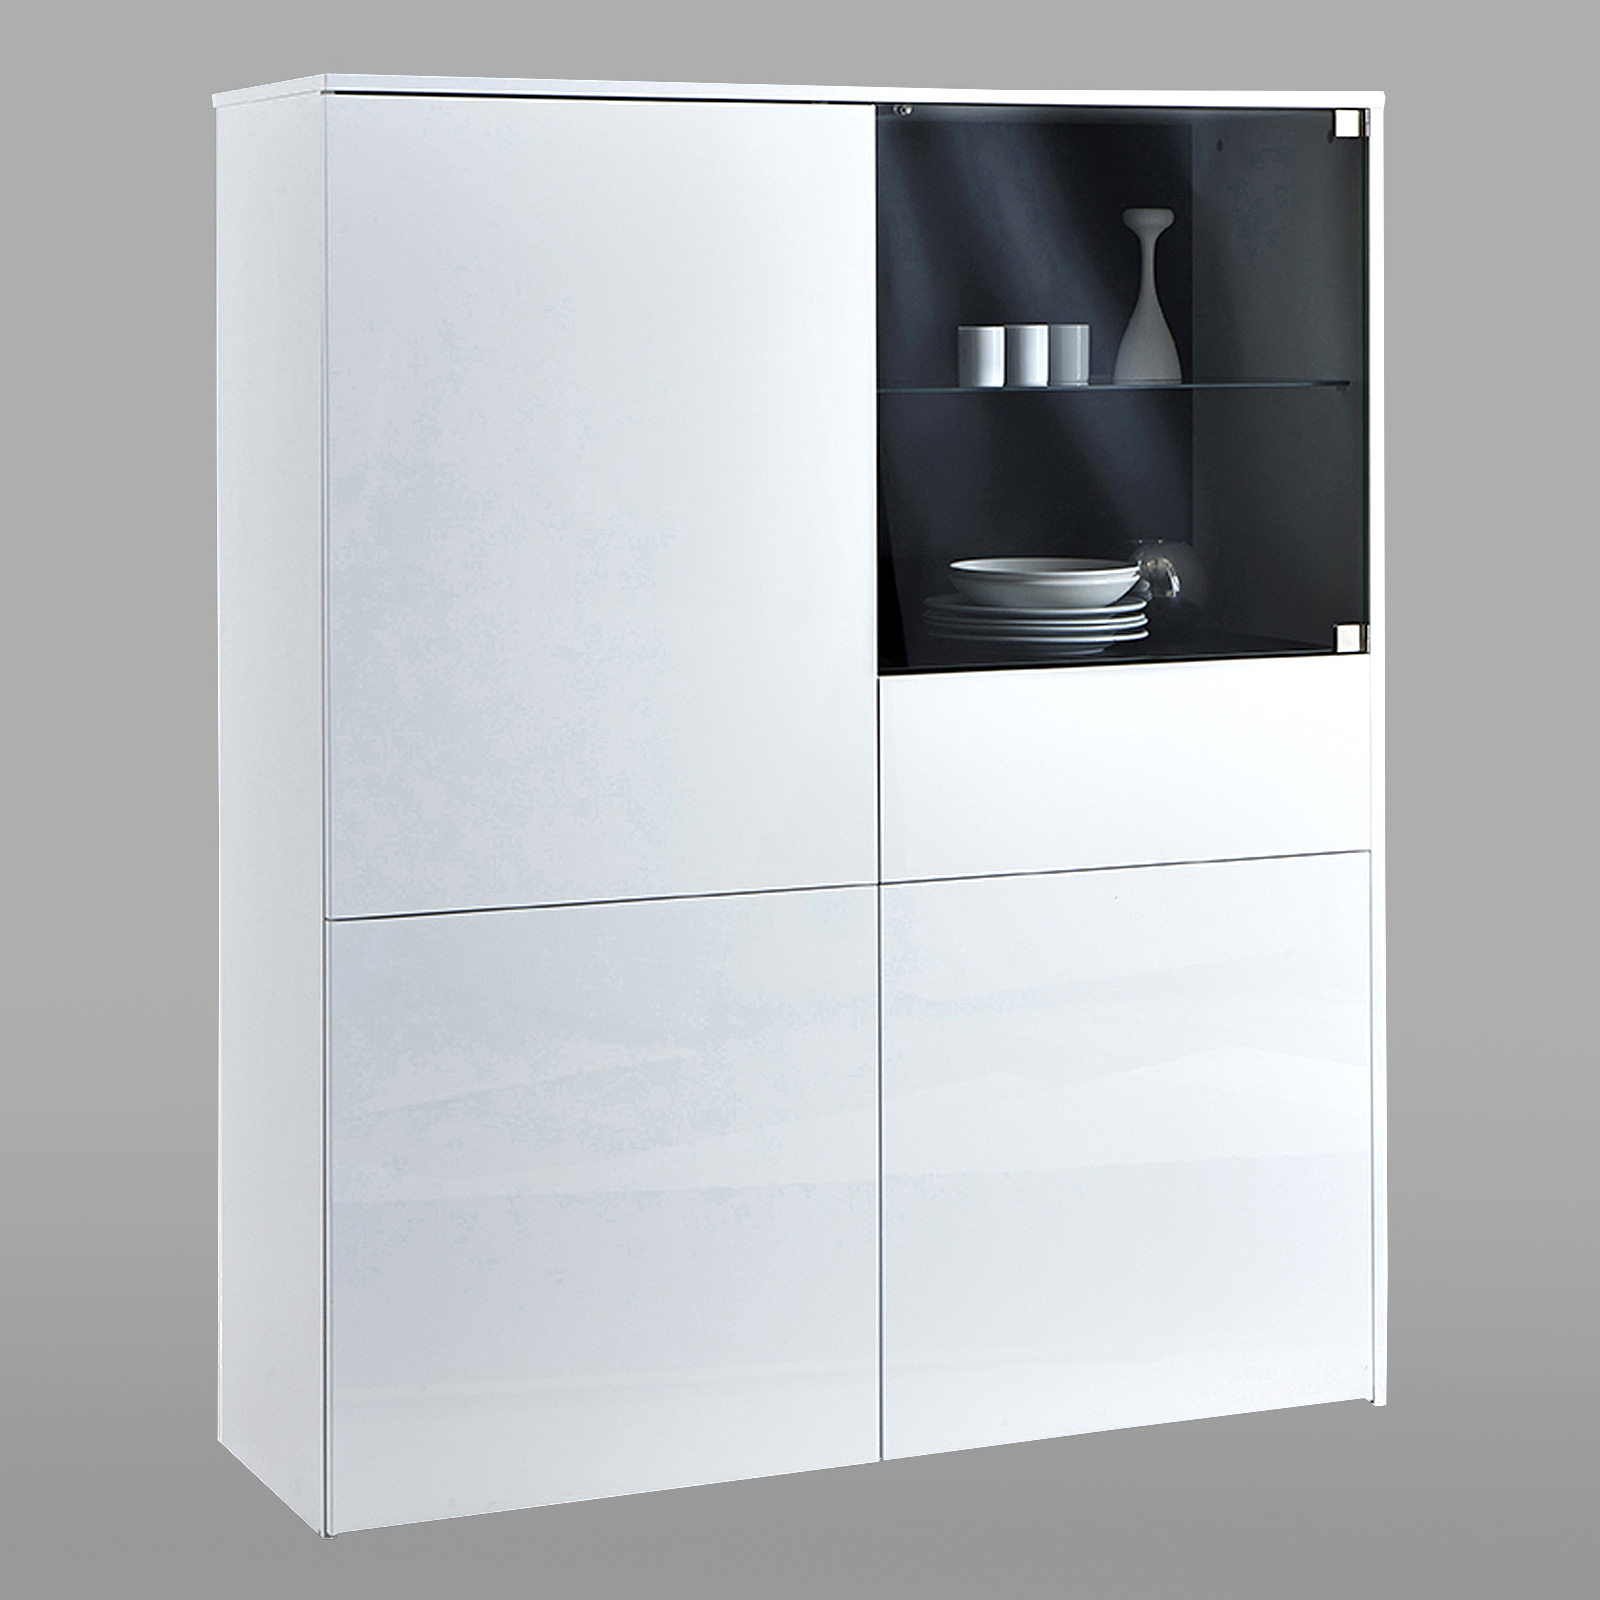 highboard malia vitrine schrank sideboard anrichte in gl nzend wei ebay. Black Bedroom Furniture Sets. Home Design Ideas